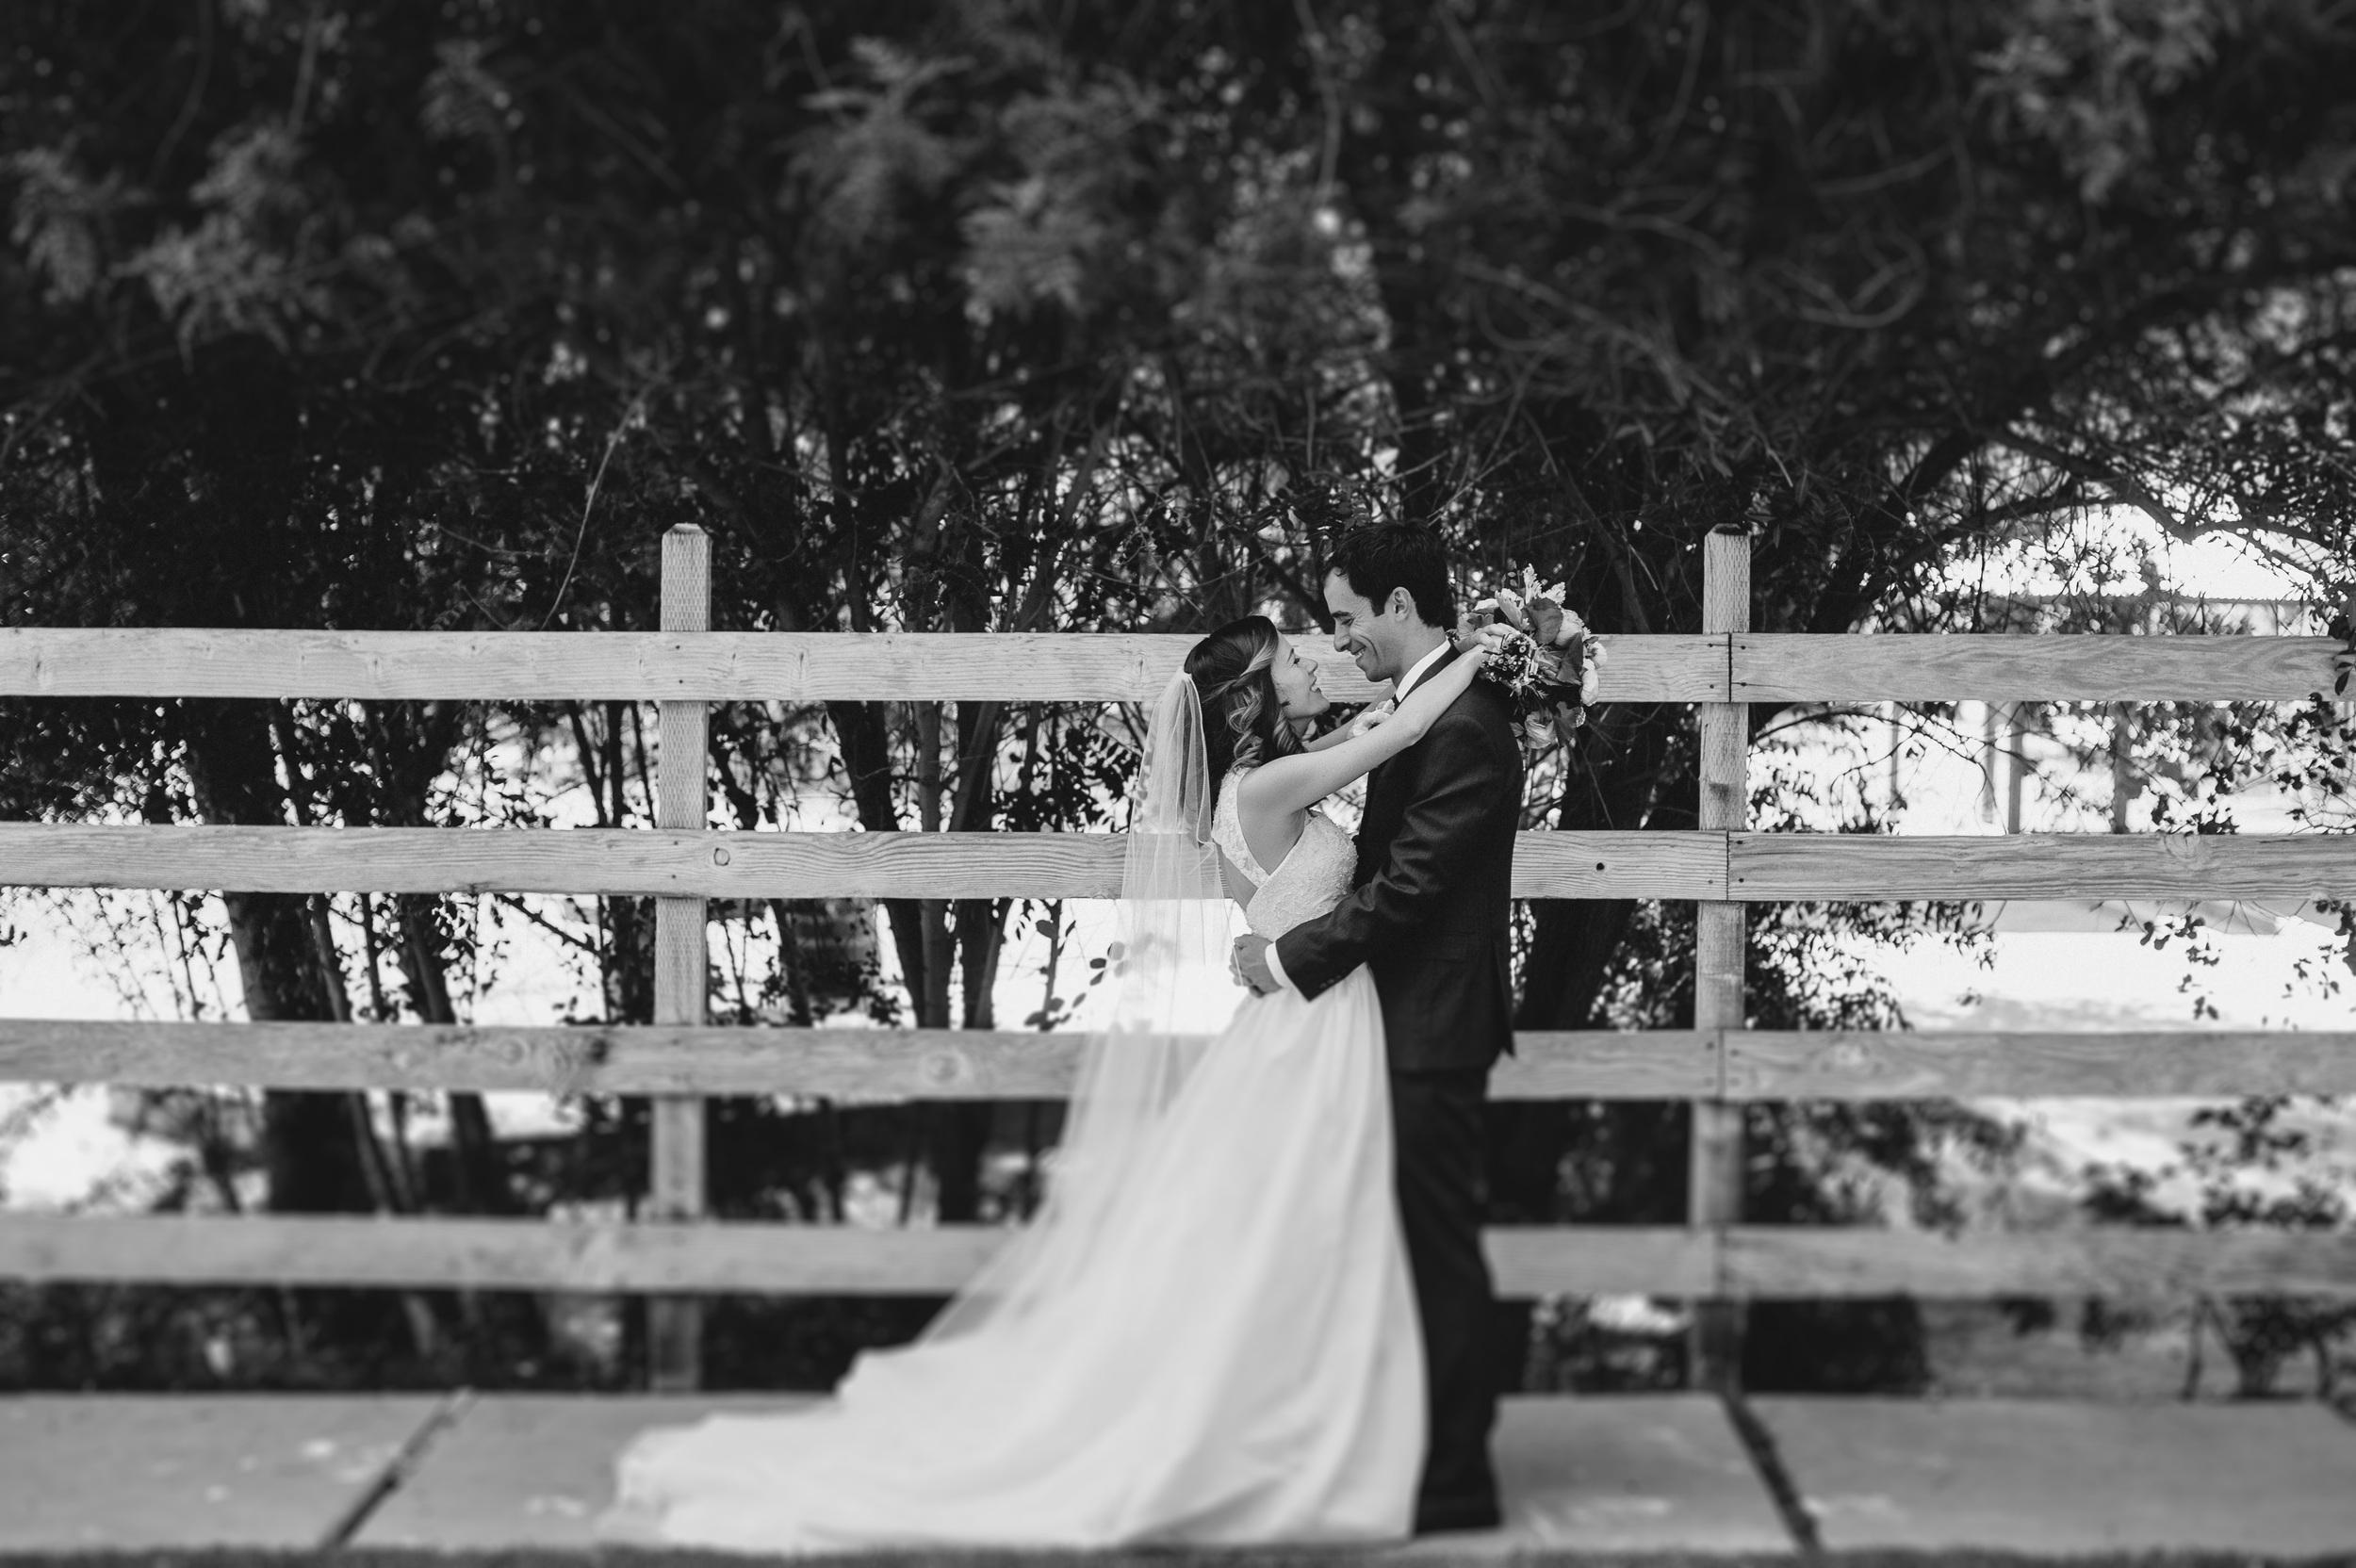 los angeles malibe cafe calamigos ranch wedding phtoographer edward lai-27.jpg